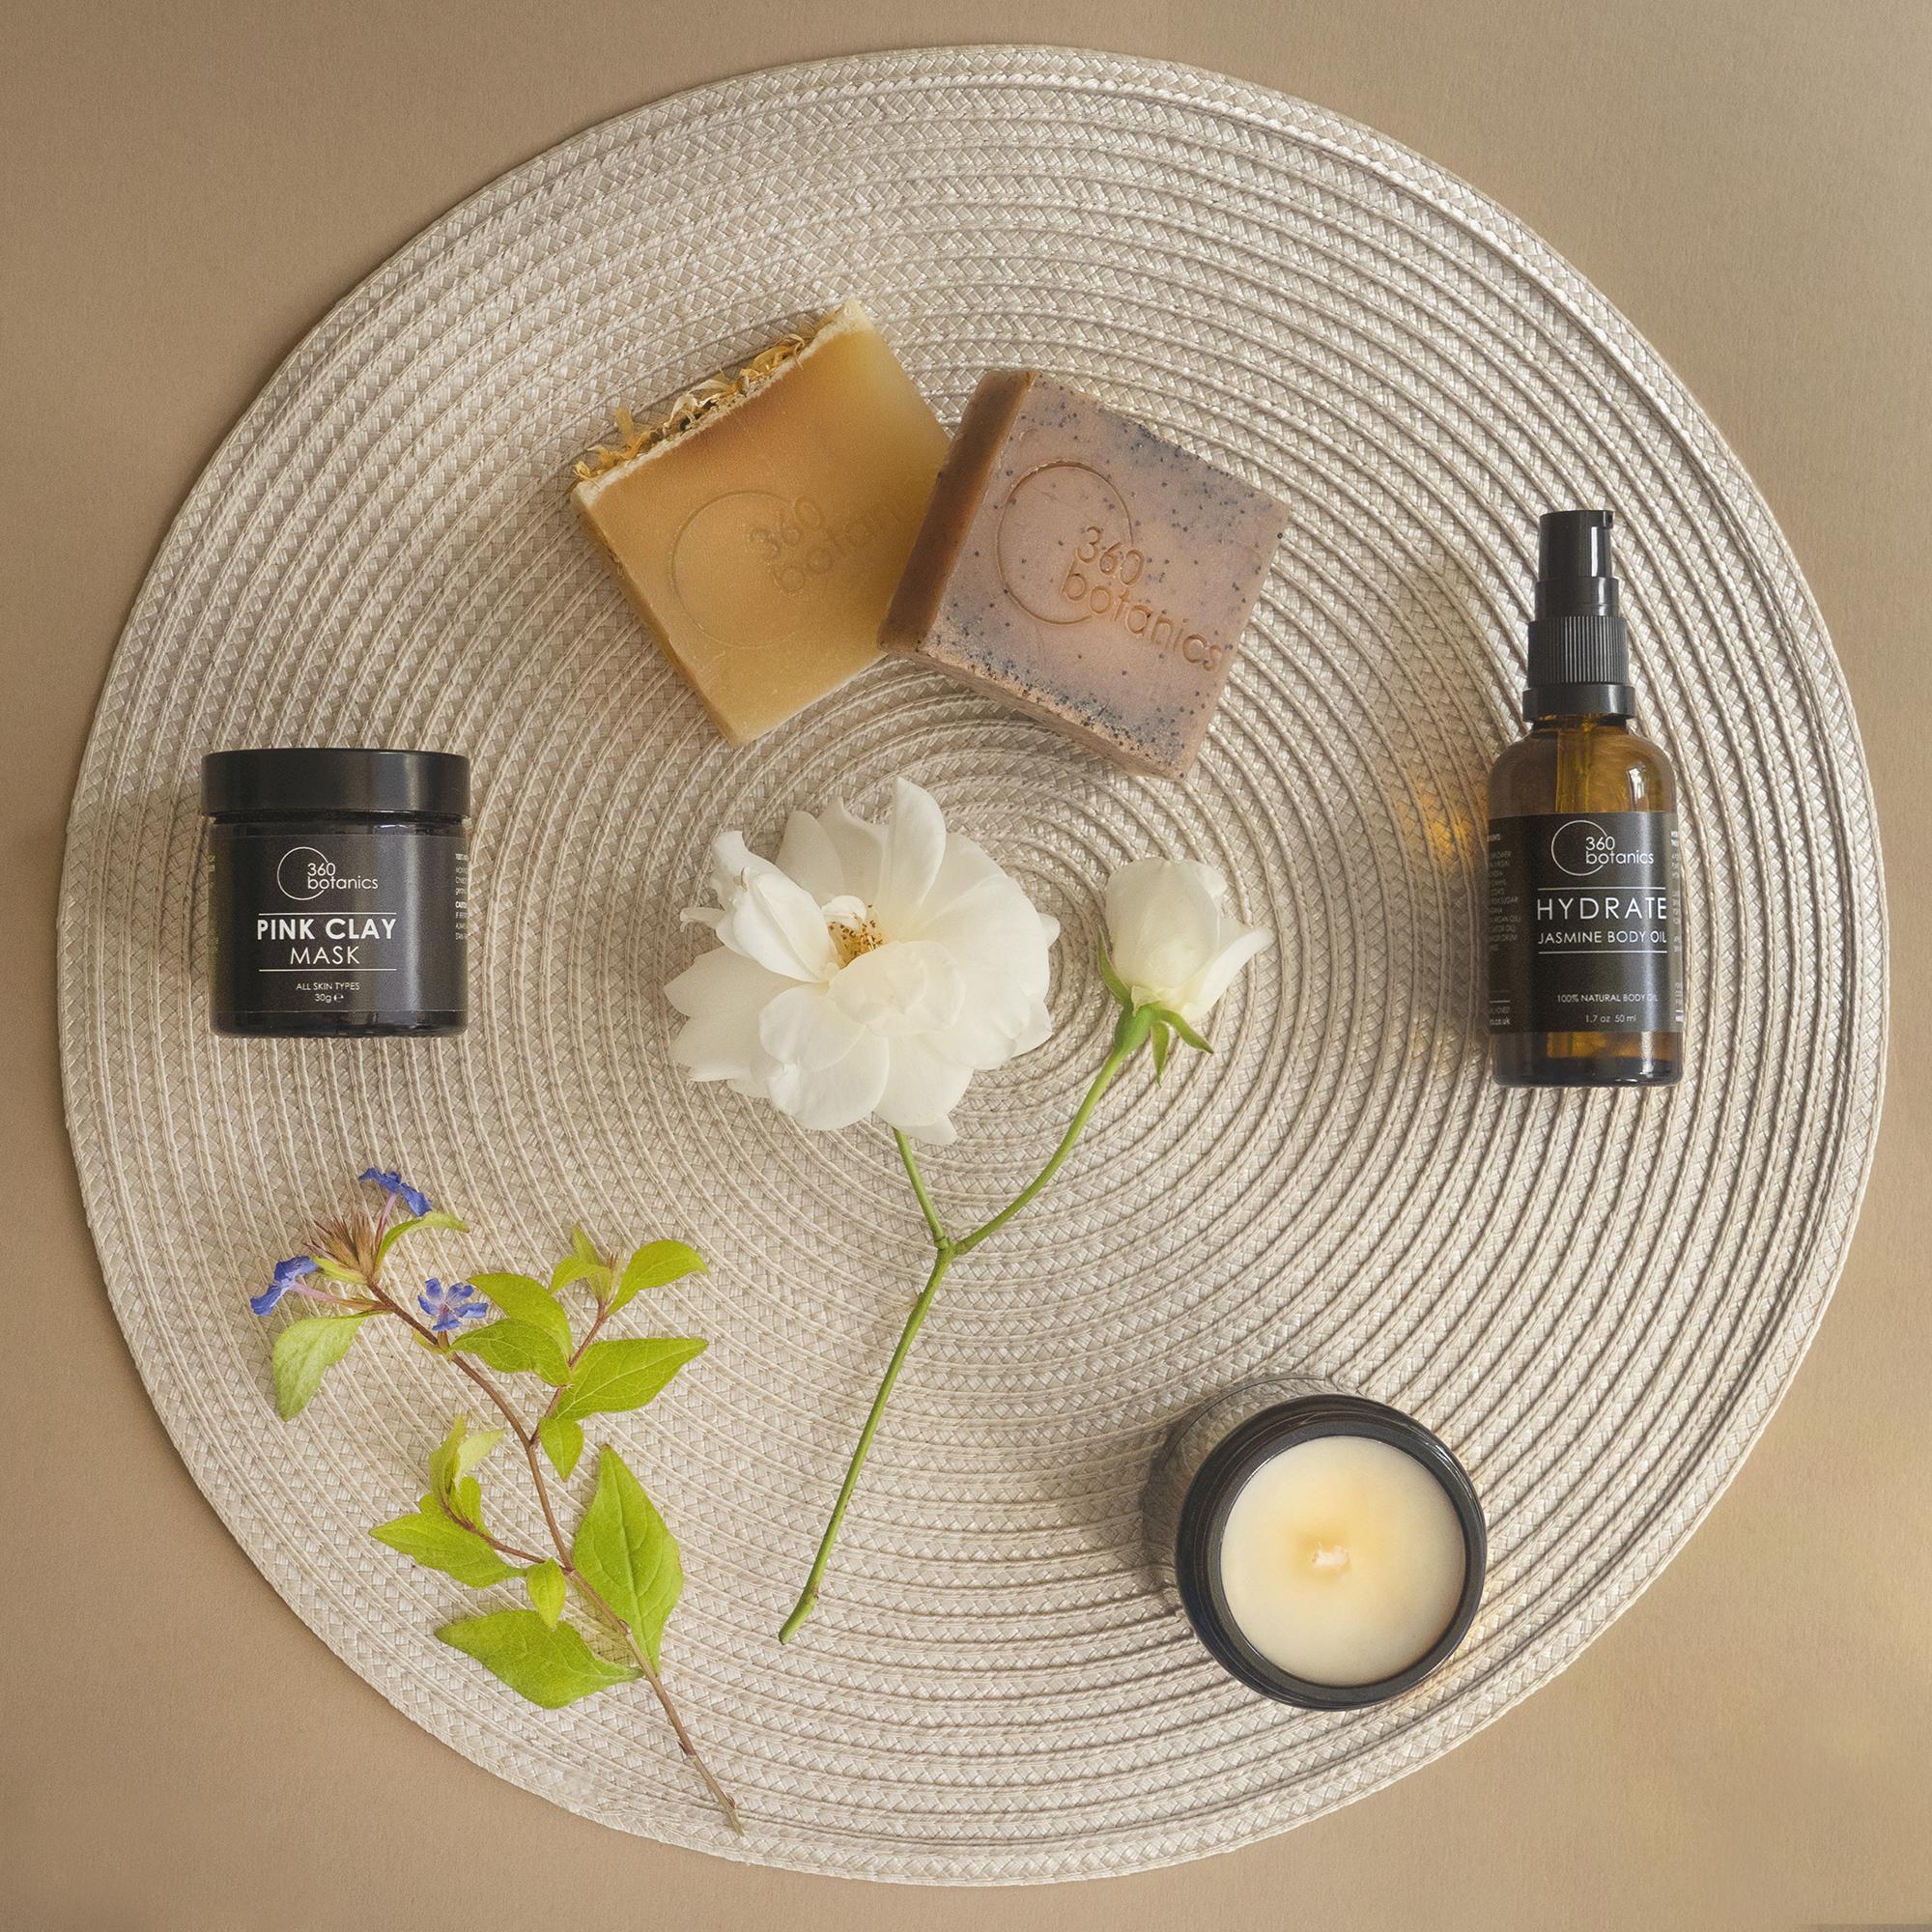 Photography Studio Flatlay Photograph for Vegan Skincare Brand 360 Botanics